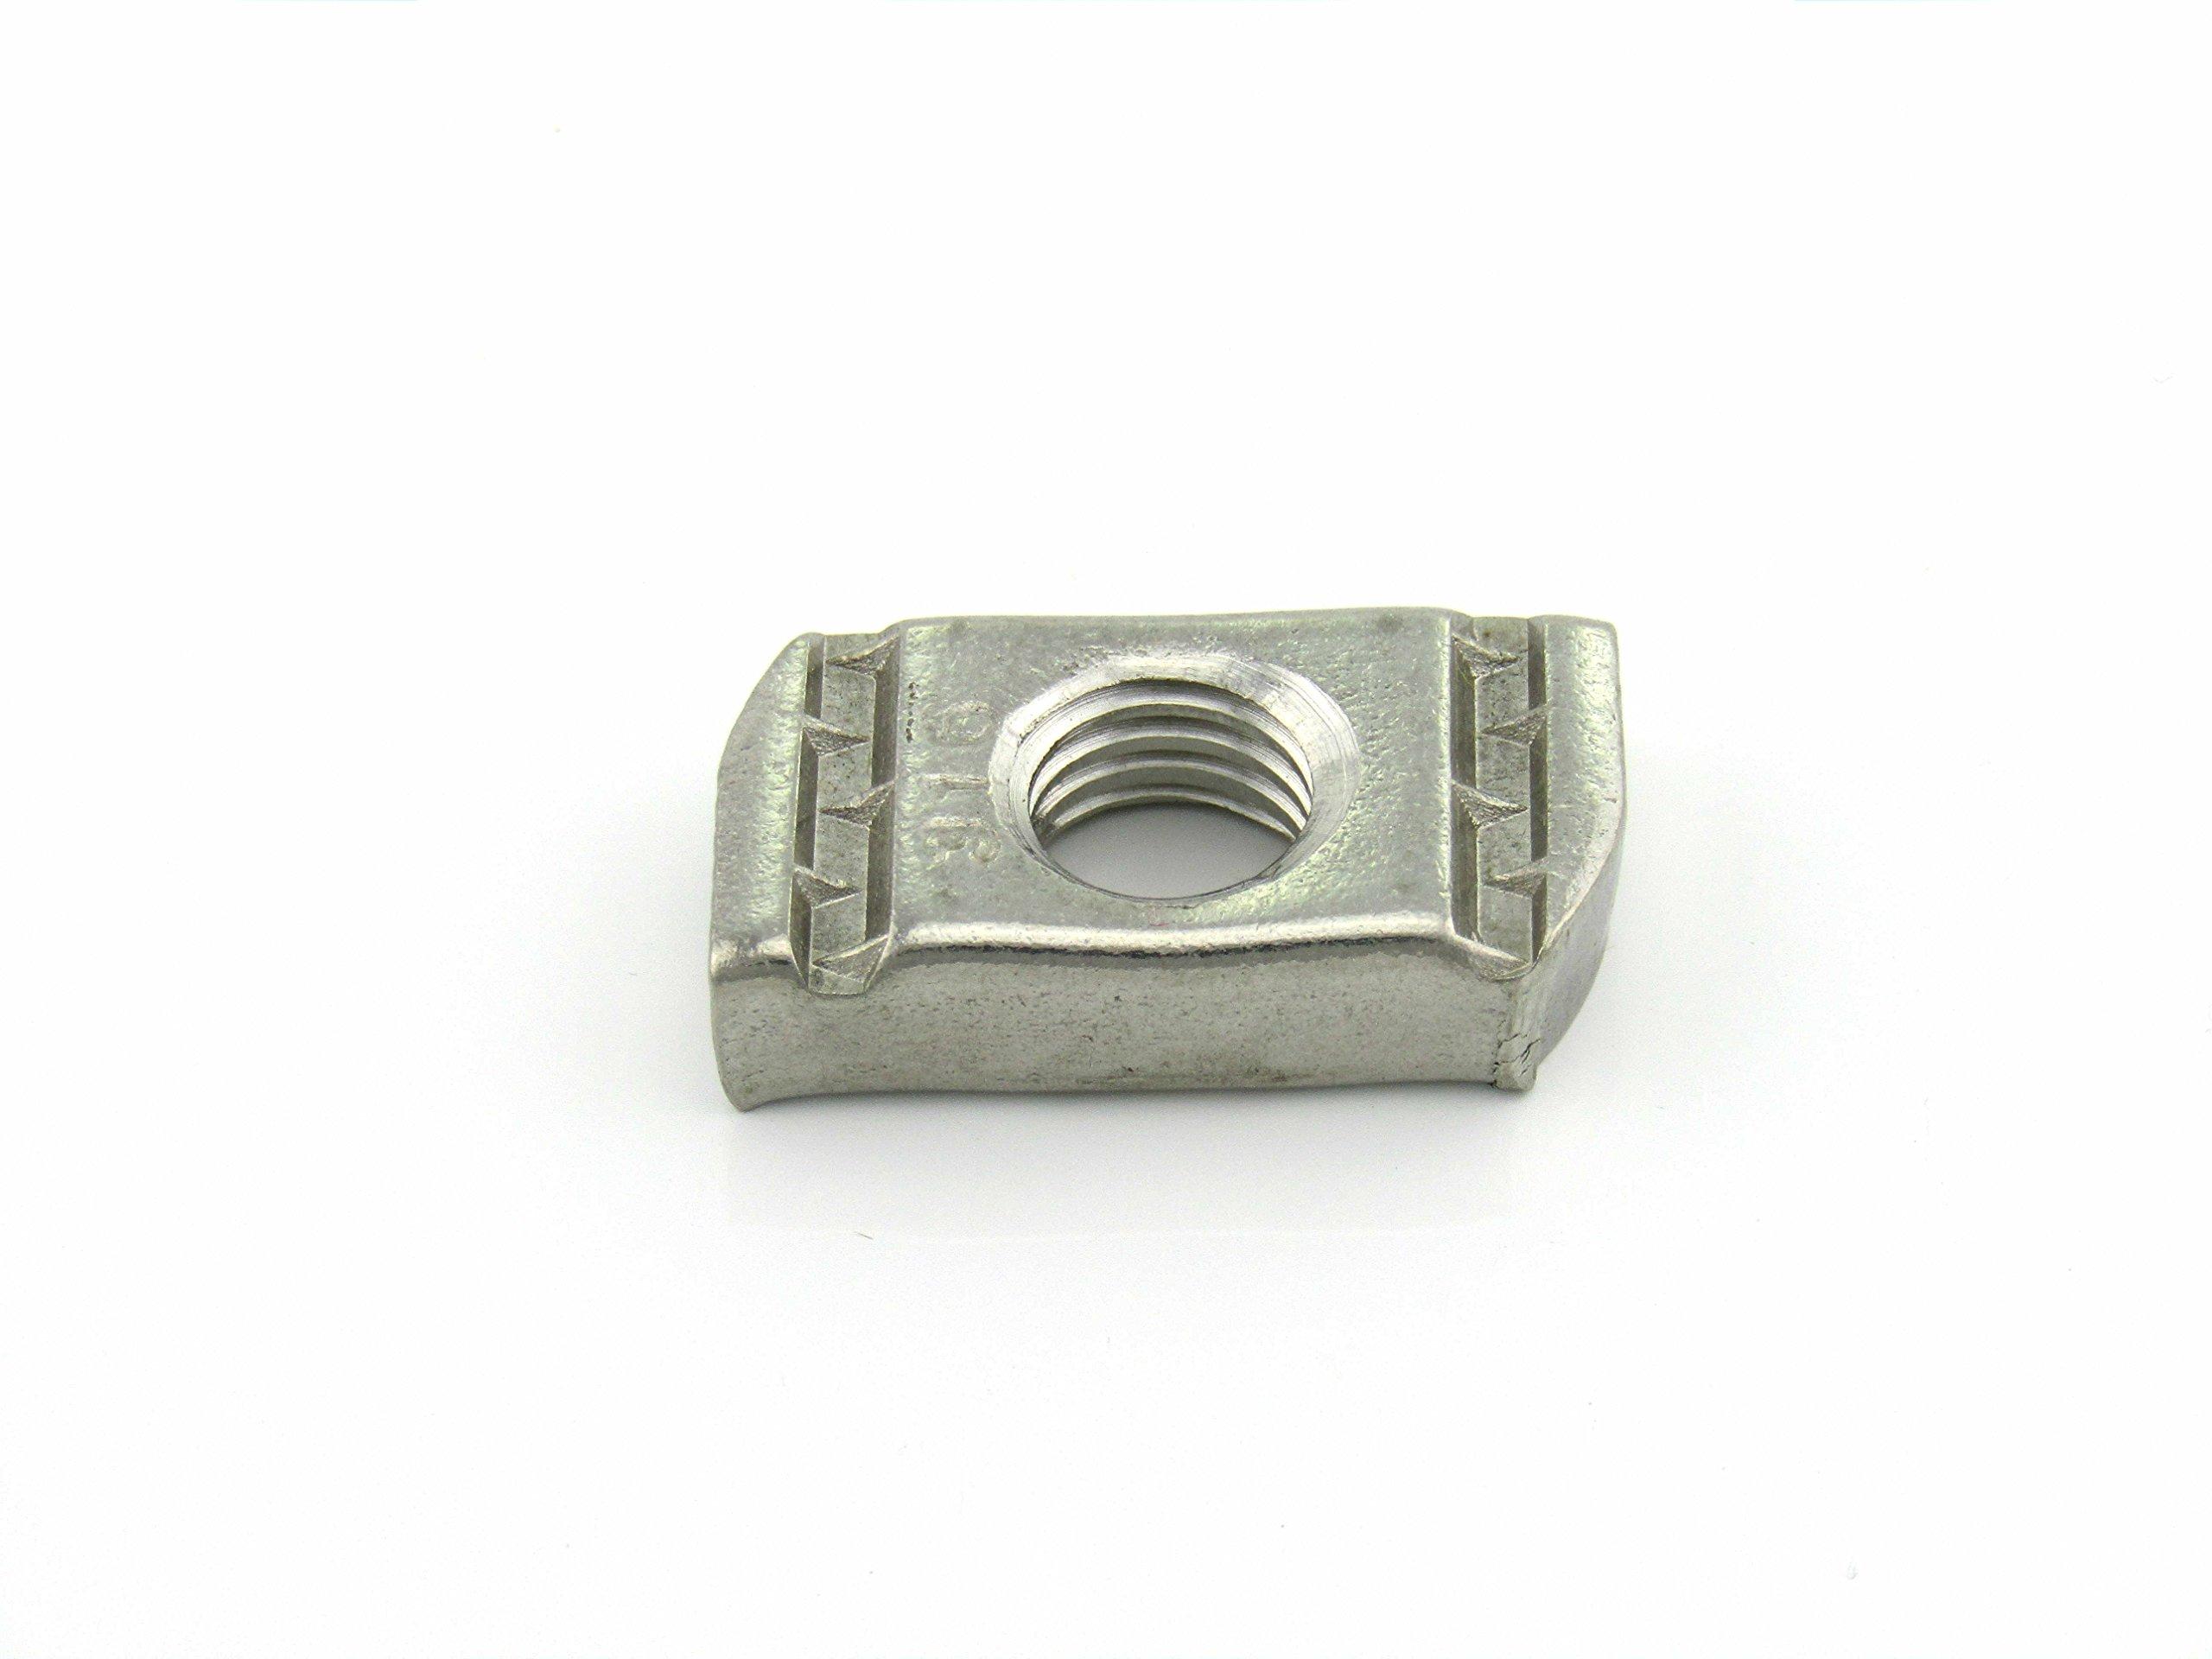 1/2-13X3/8 Thick No Spring Nut (100 per box)